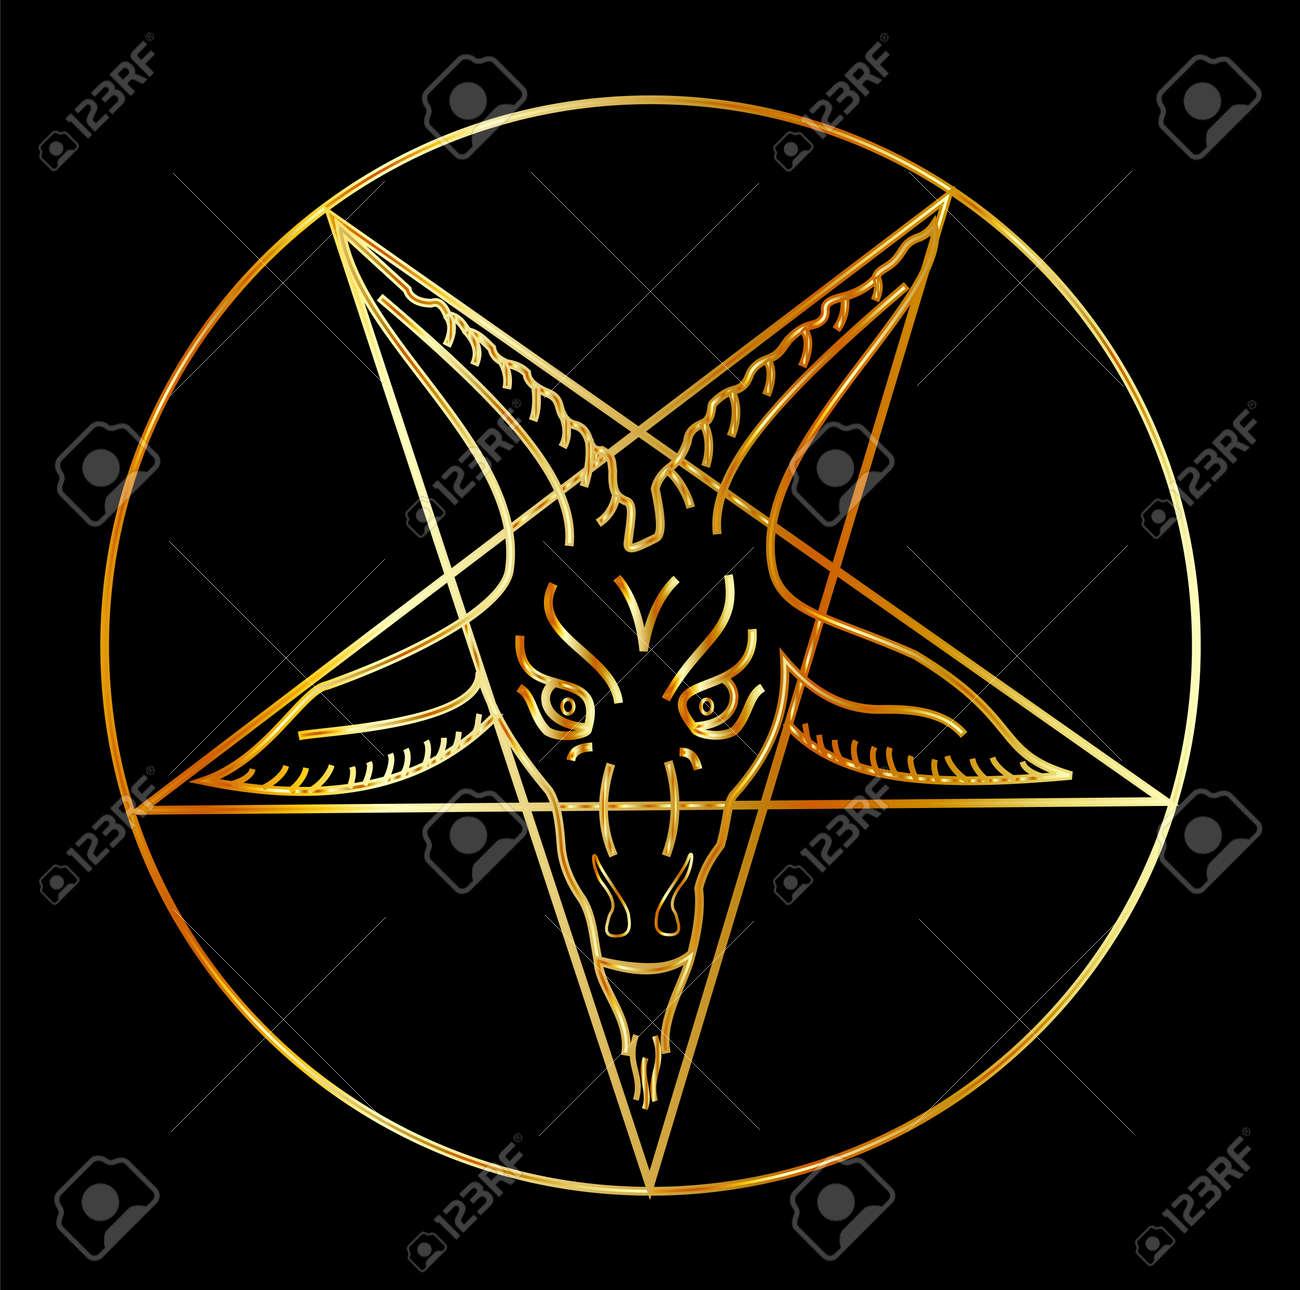 Golden sigil of baphomet satanism symbol royalty free cliparts golden sigil of baphomet satanism symbol stock vector 53140864 biocorpaavc Choice Image